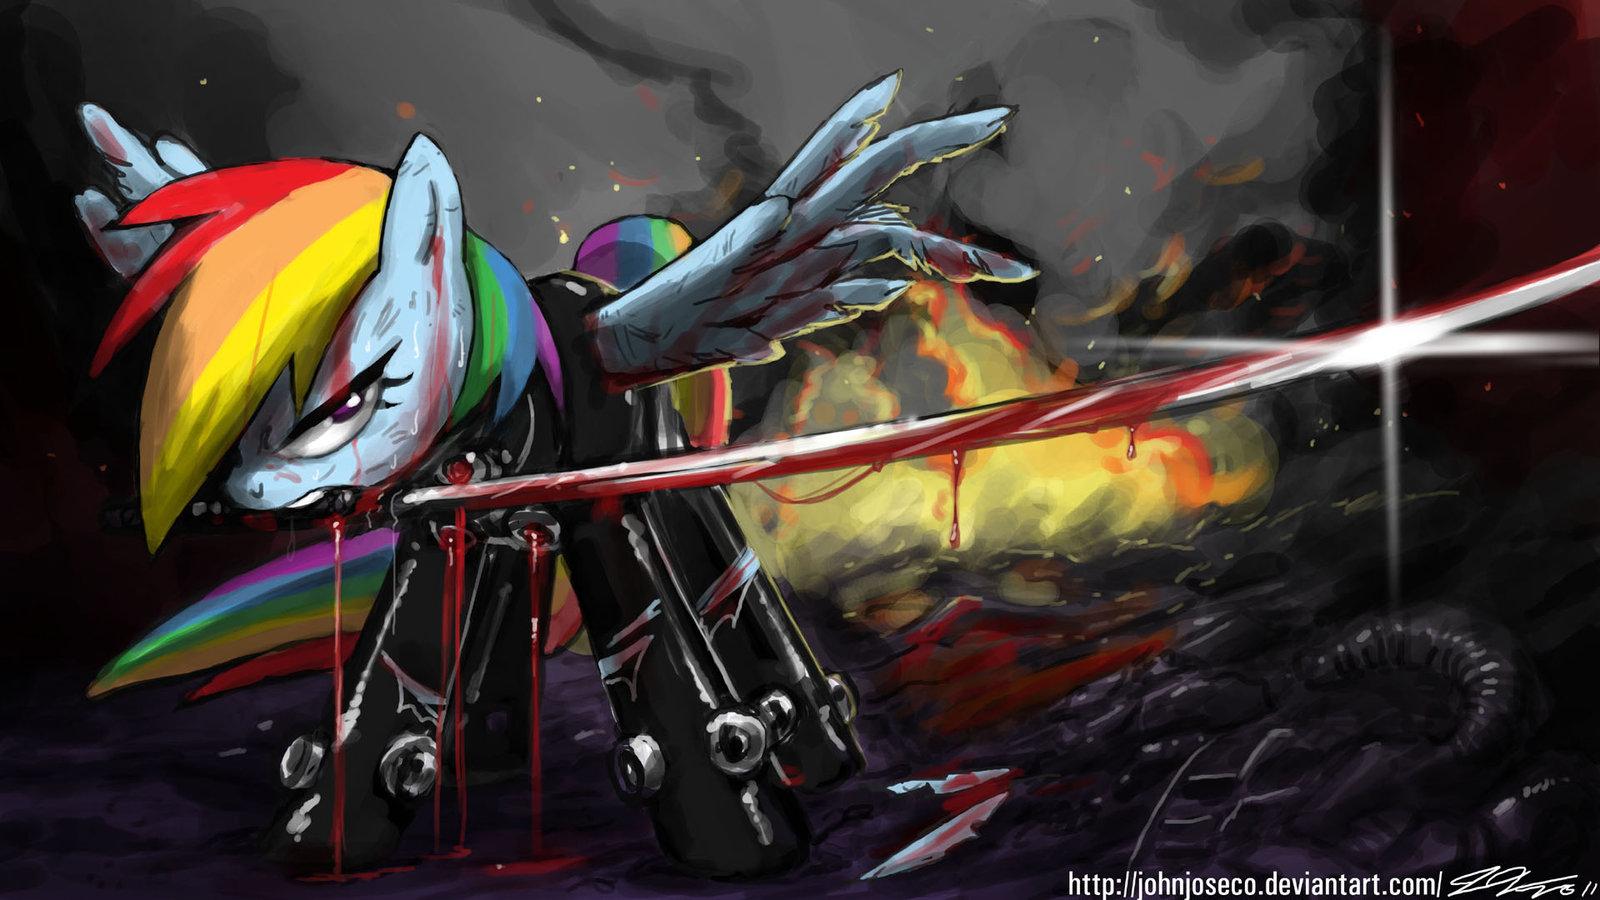 http://4.bp.blogspot.com/-kaCIn2AoYaw/Tidixbms1VI/AAAAAAAAI2g/qSPC7pVZE18/s1600/gantz_rainbow_dash_by_johnjoseco-d411e0s.jpg